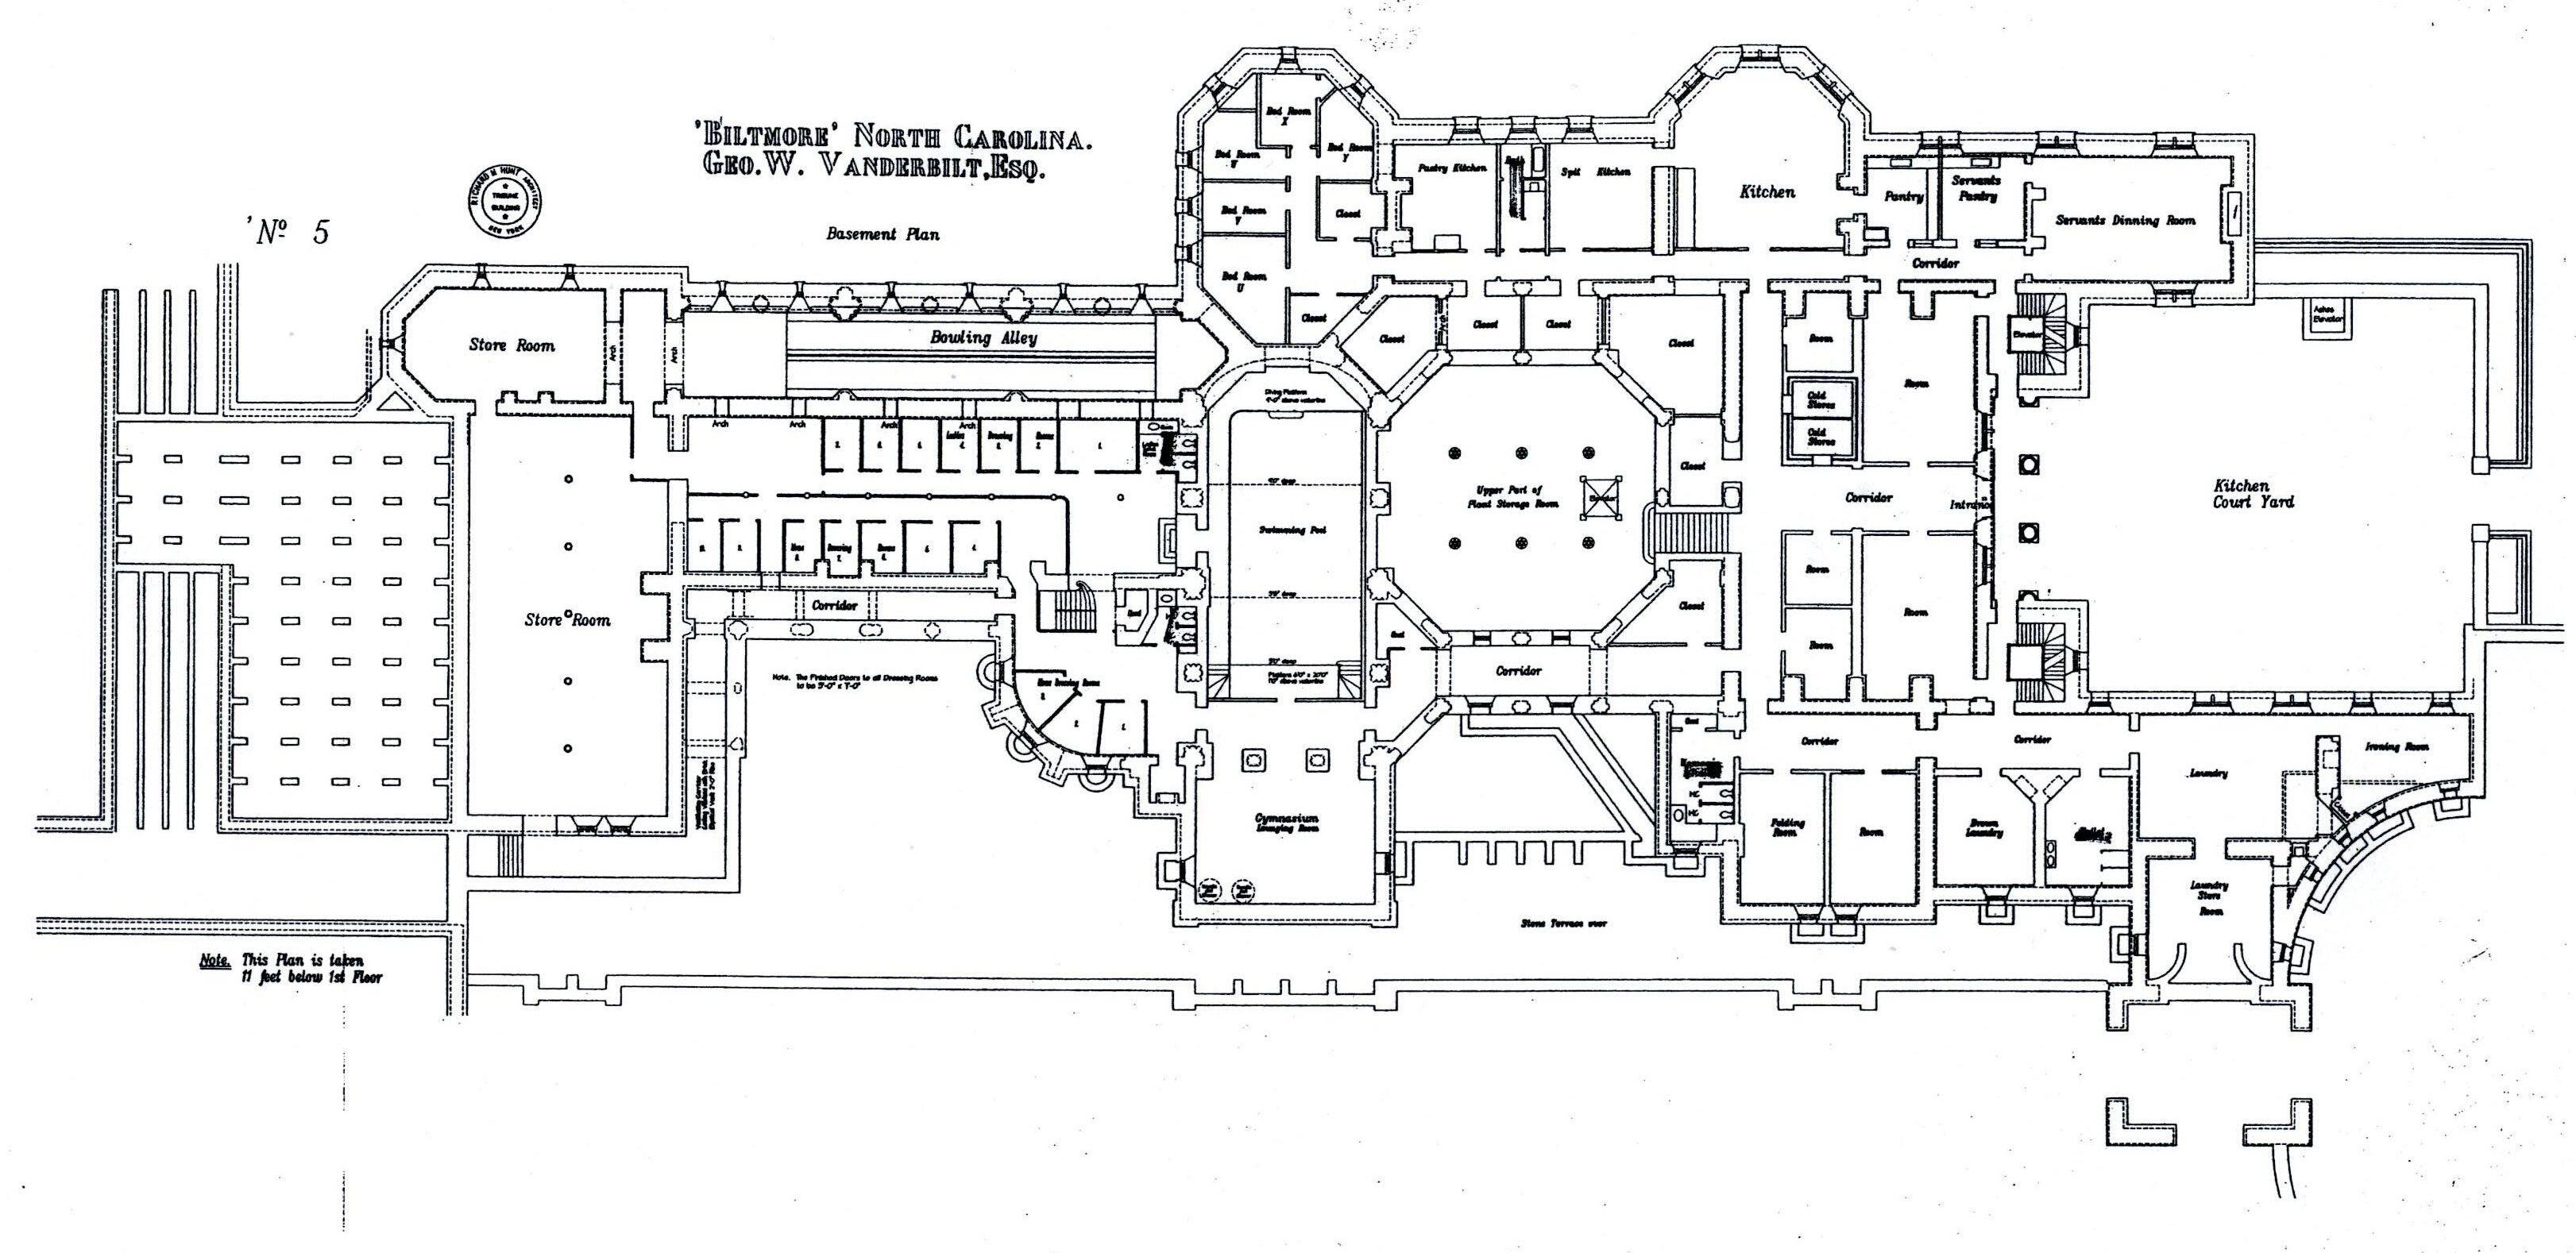 Biltmore basement floor plan with lights labeled  Gilded